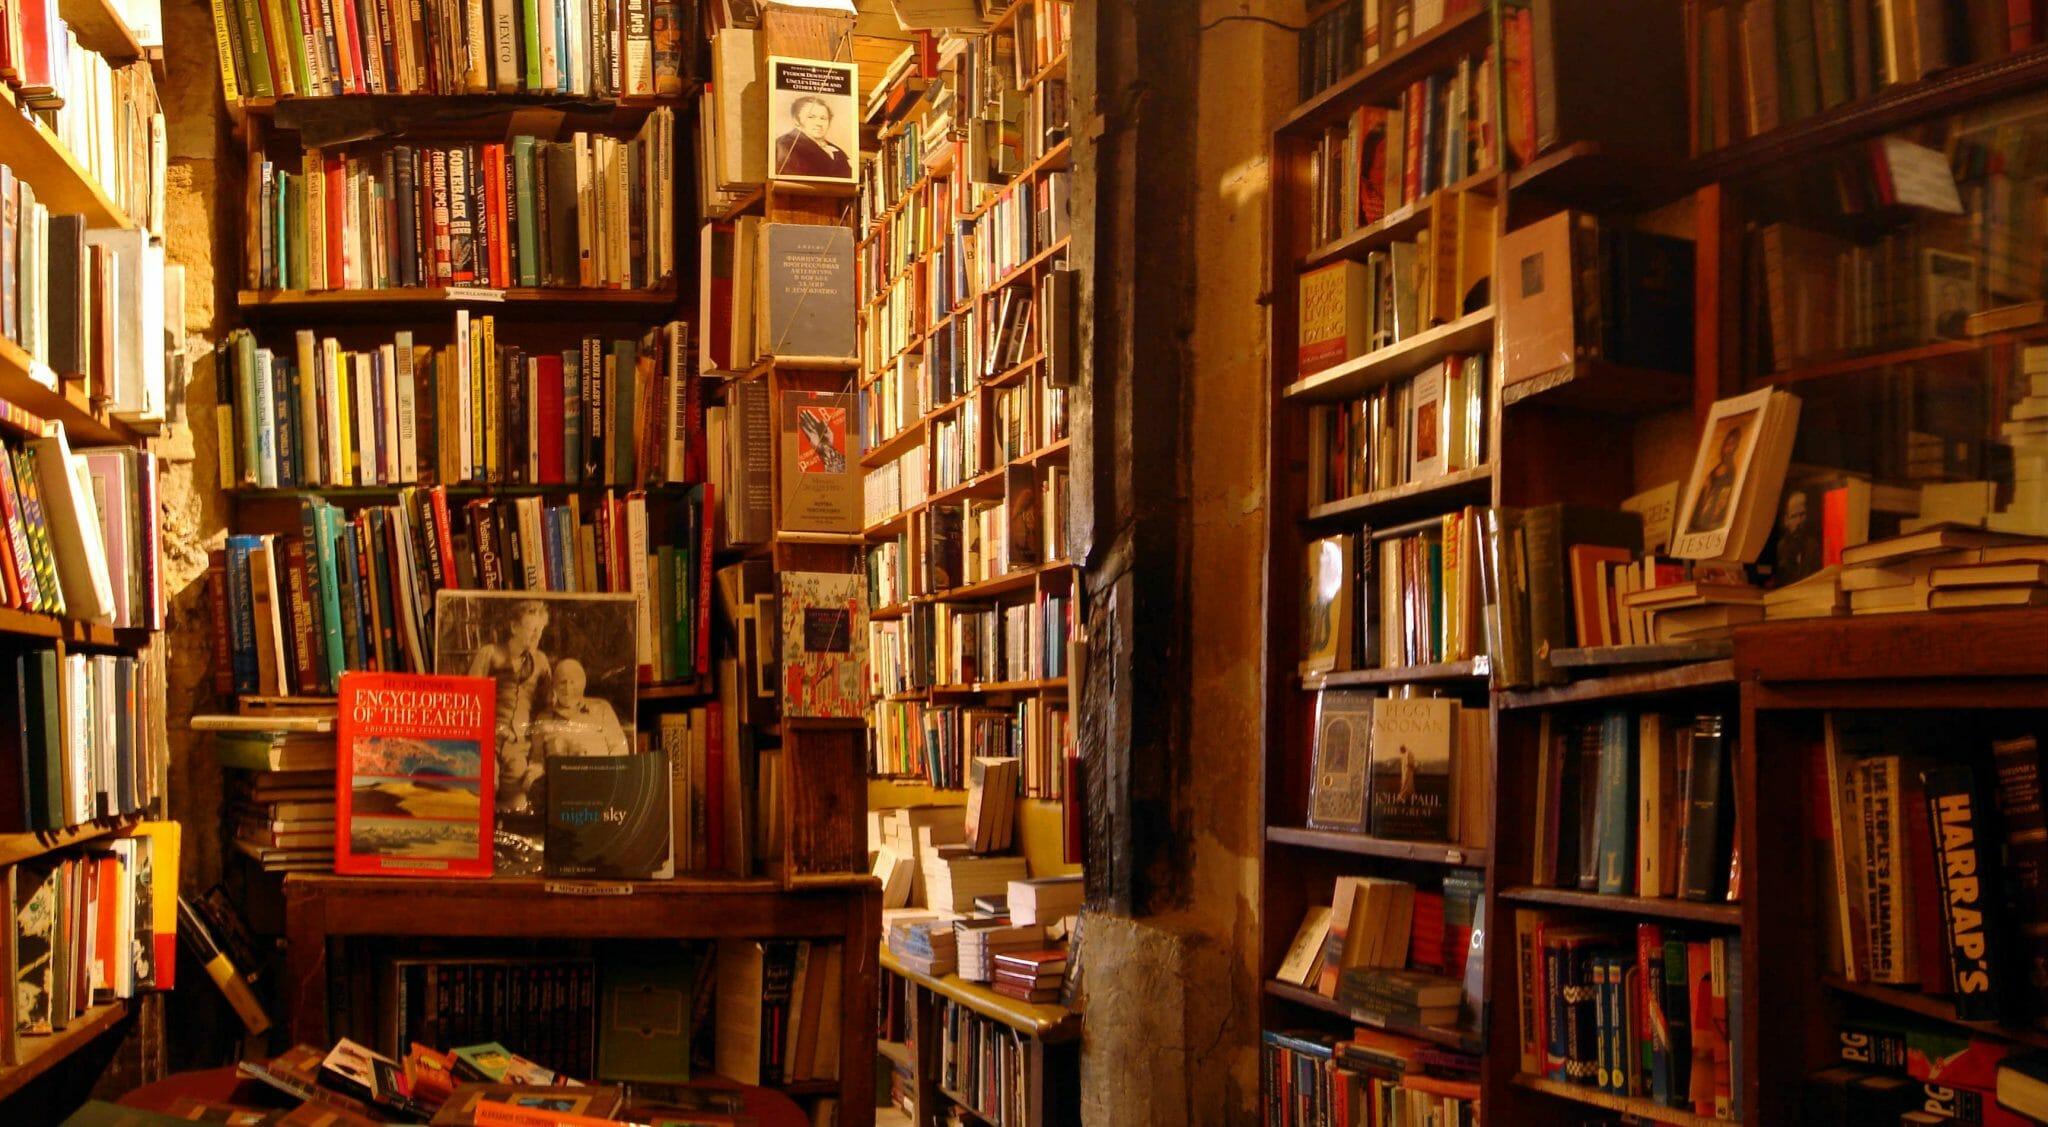 Menù letterari: le ricette nei grandi romanzi